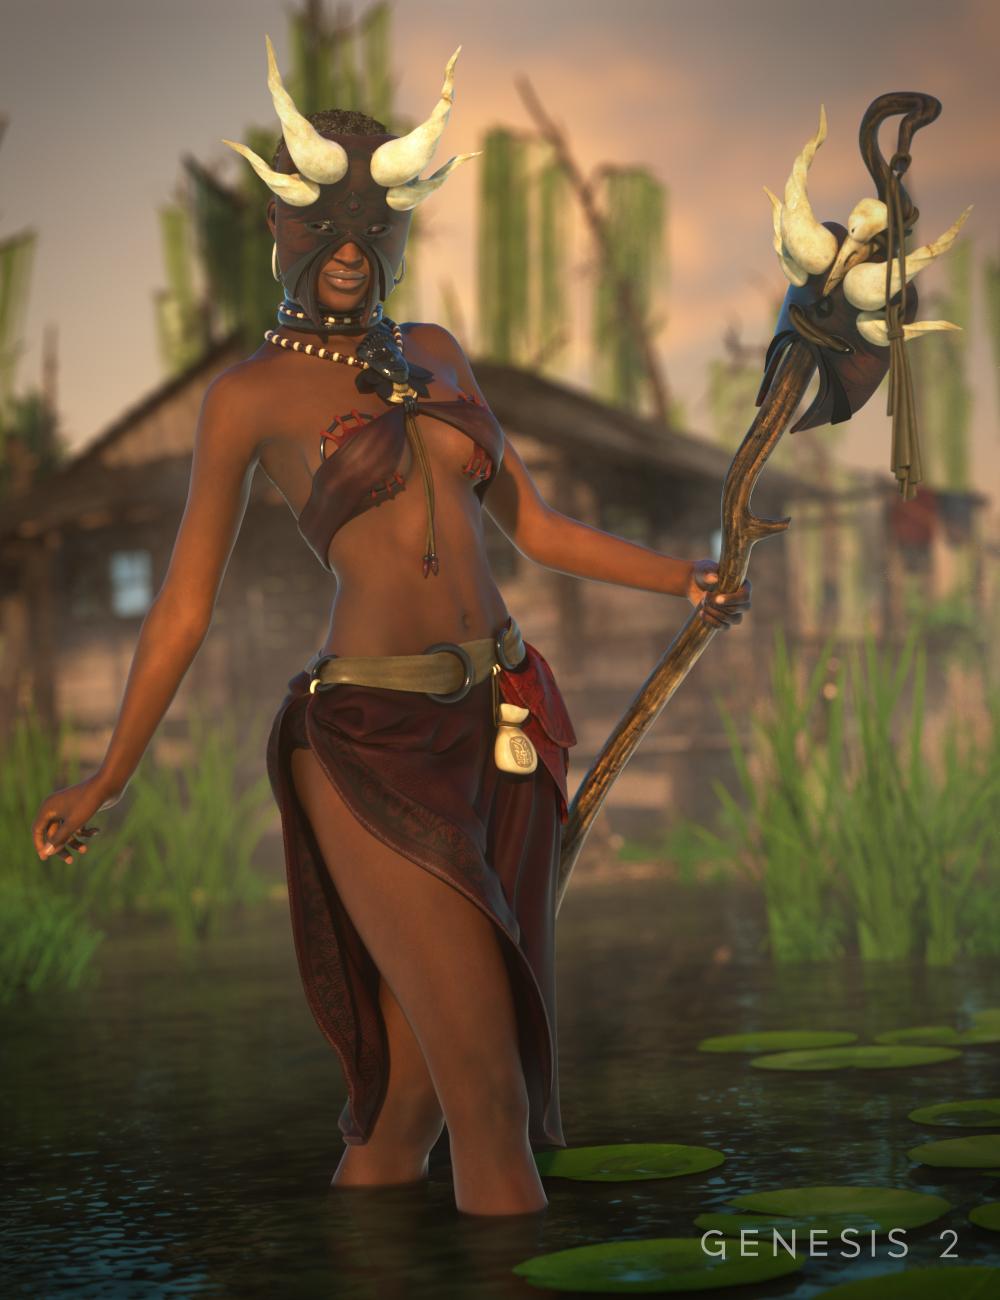 Tribal Dancer for Genesis 2 Female(s) by: ArienMada, 3D Models by Daz 3D